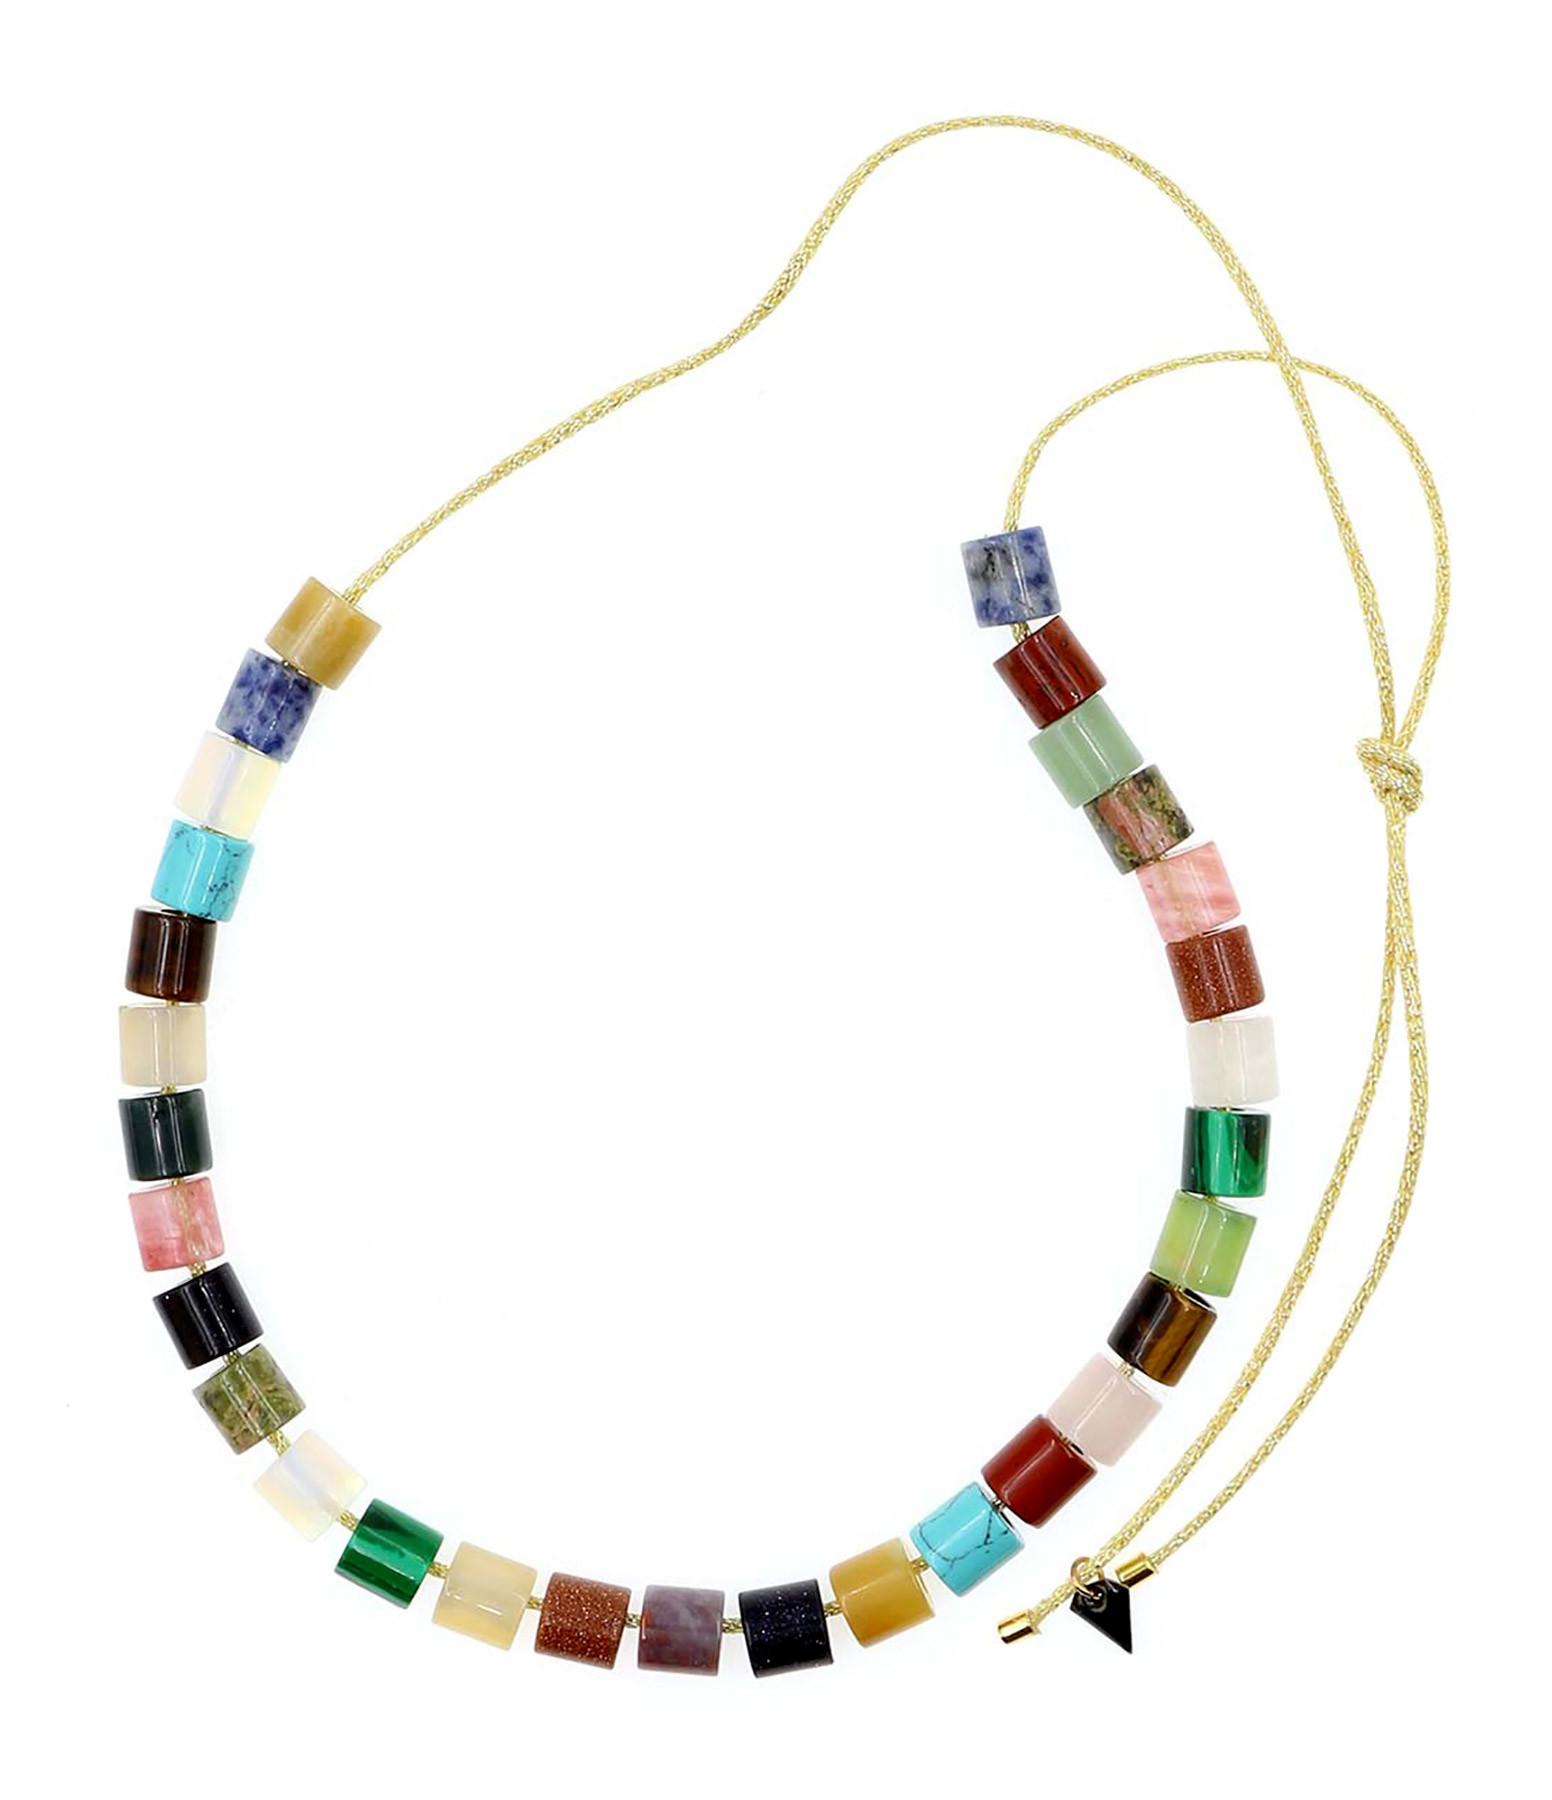 MON PRECIEUX GEM - Sautoir Grosses Perles Tube Pierres Multicolore